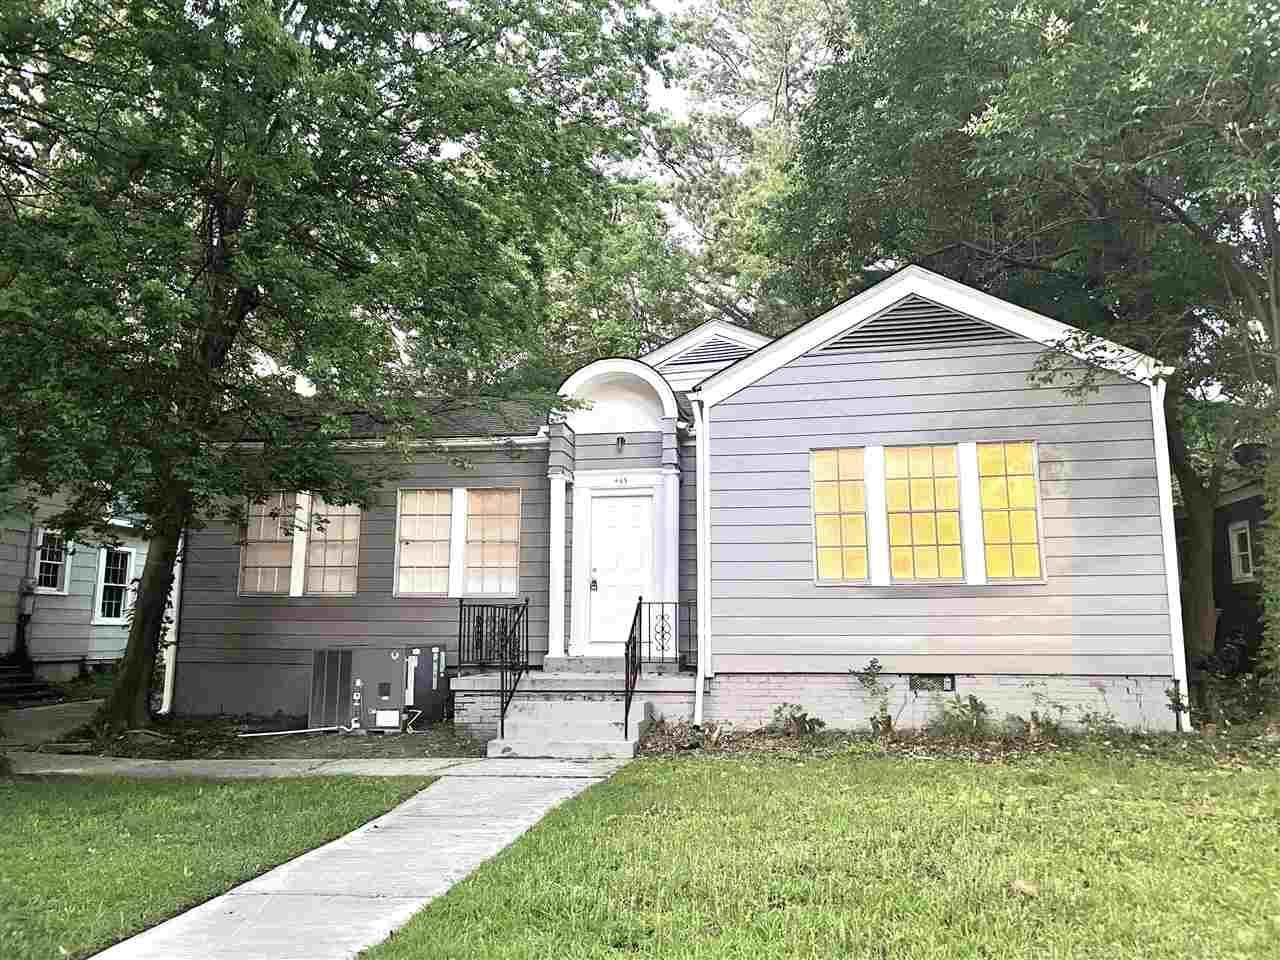 465 E RIDGEWAY ST, Jackson, MS 39206 - MLS#: 341403